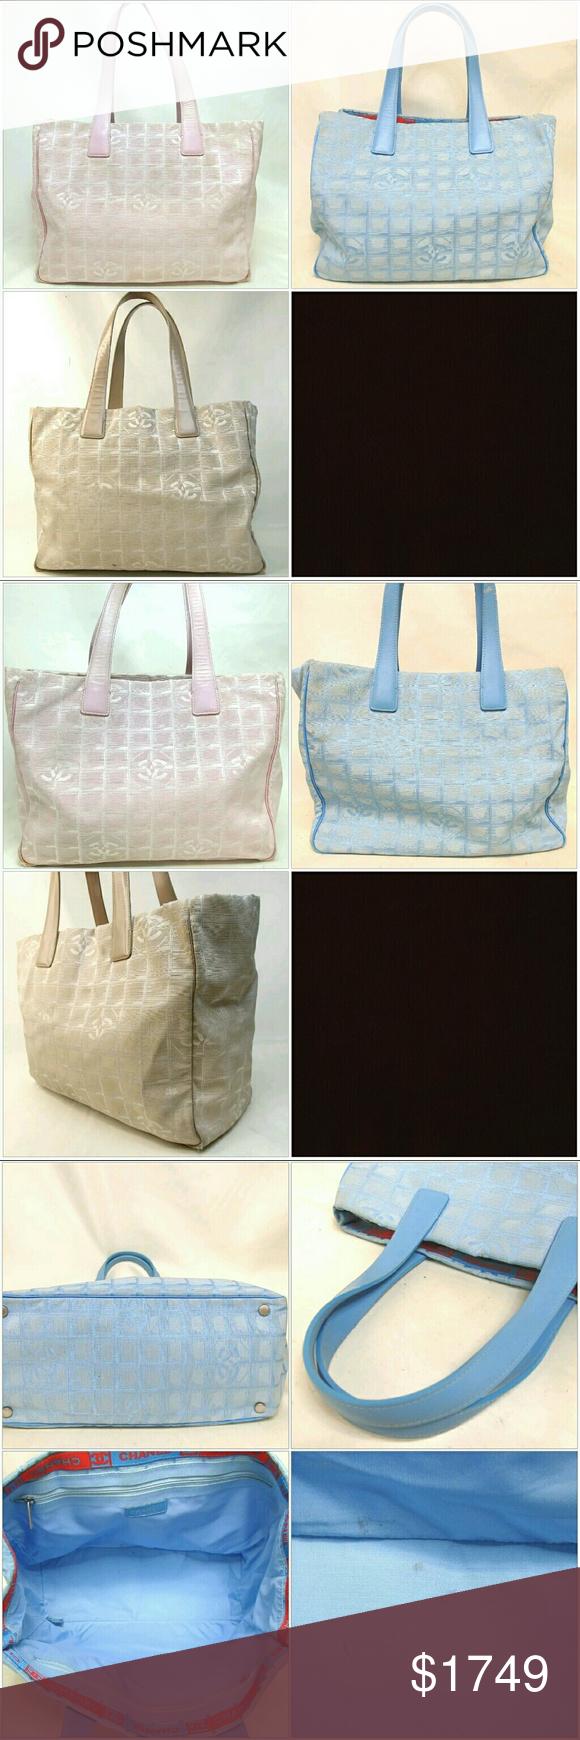 3 set lot Chanel logo travel jacquard shoulder bag 3e51f0ec37